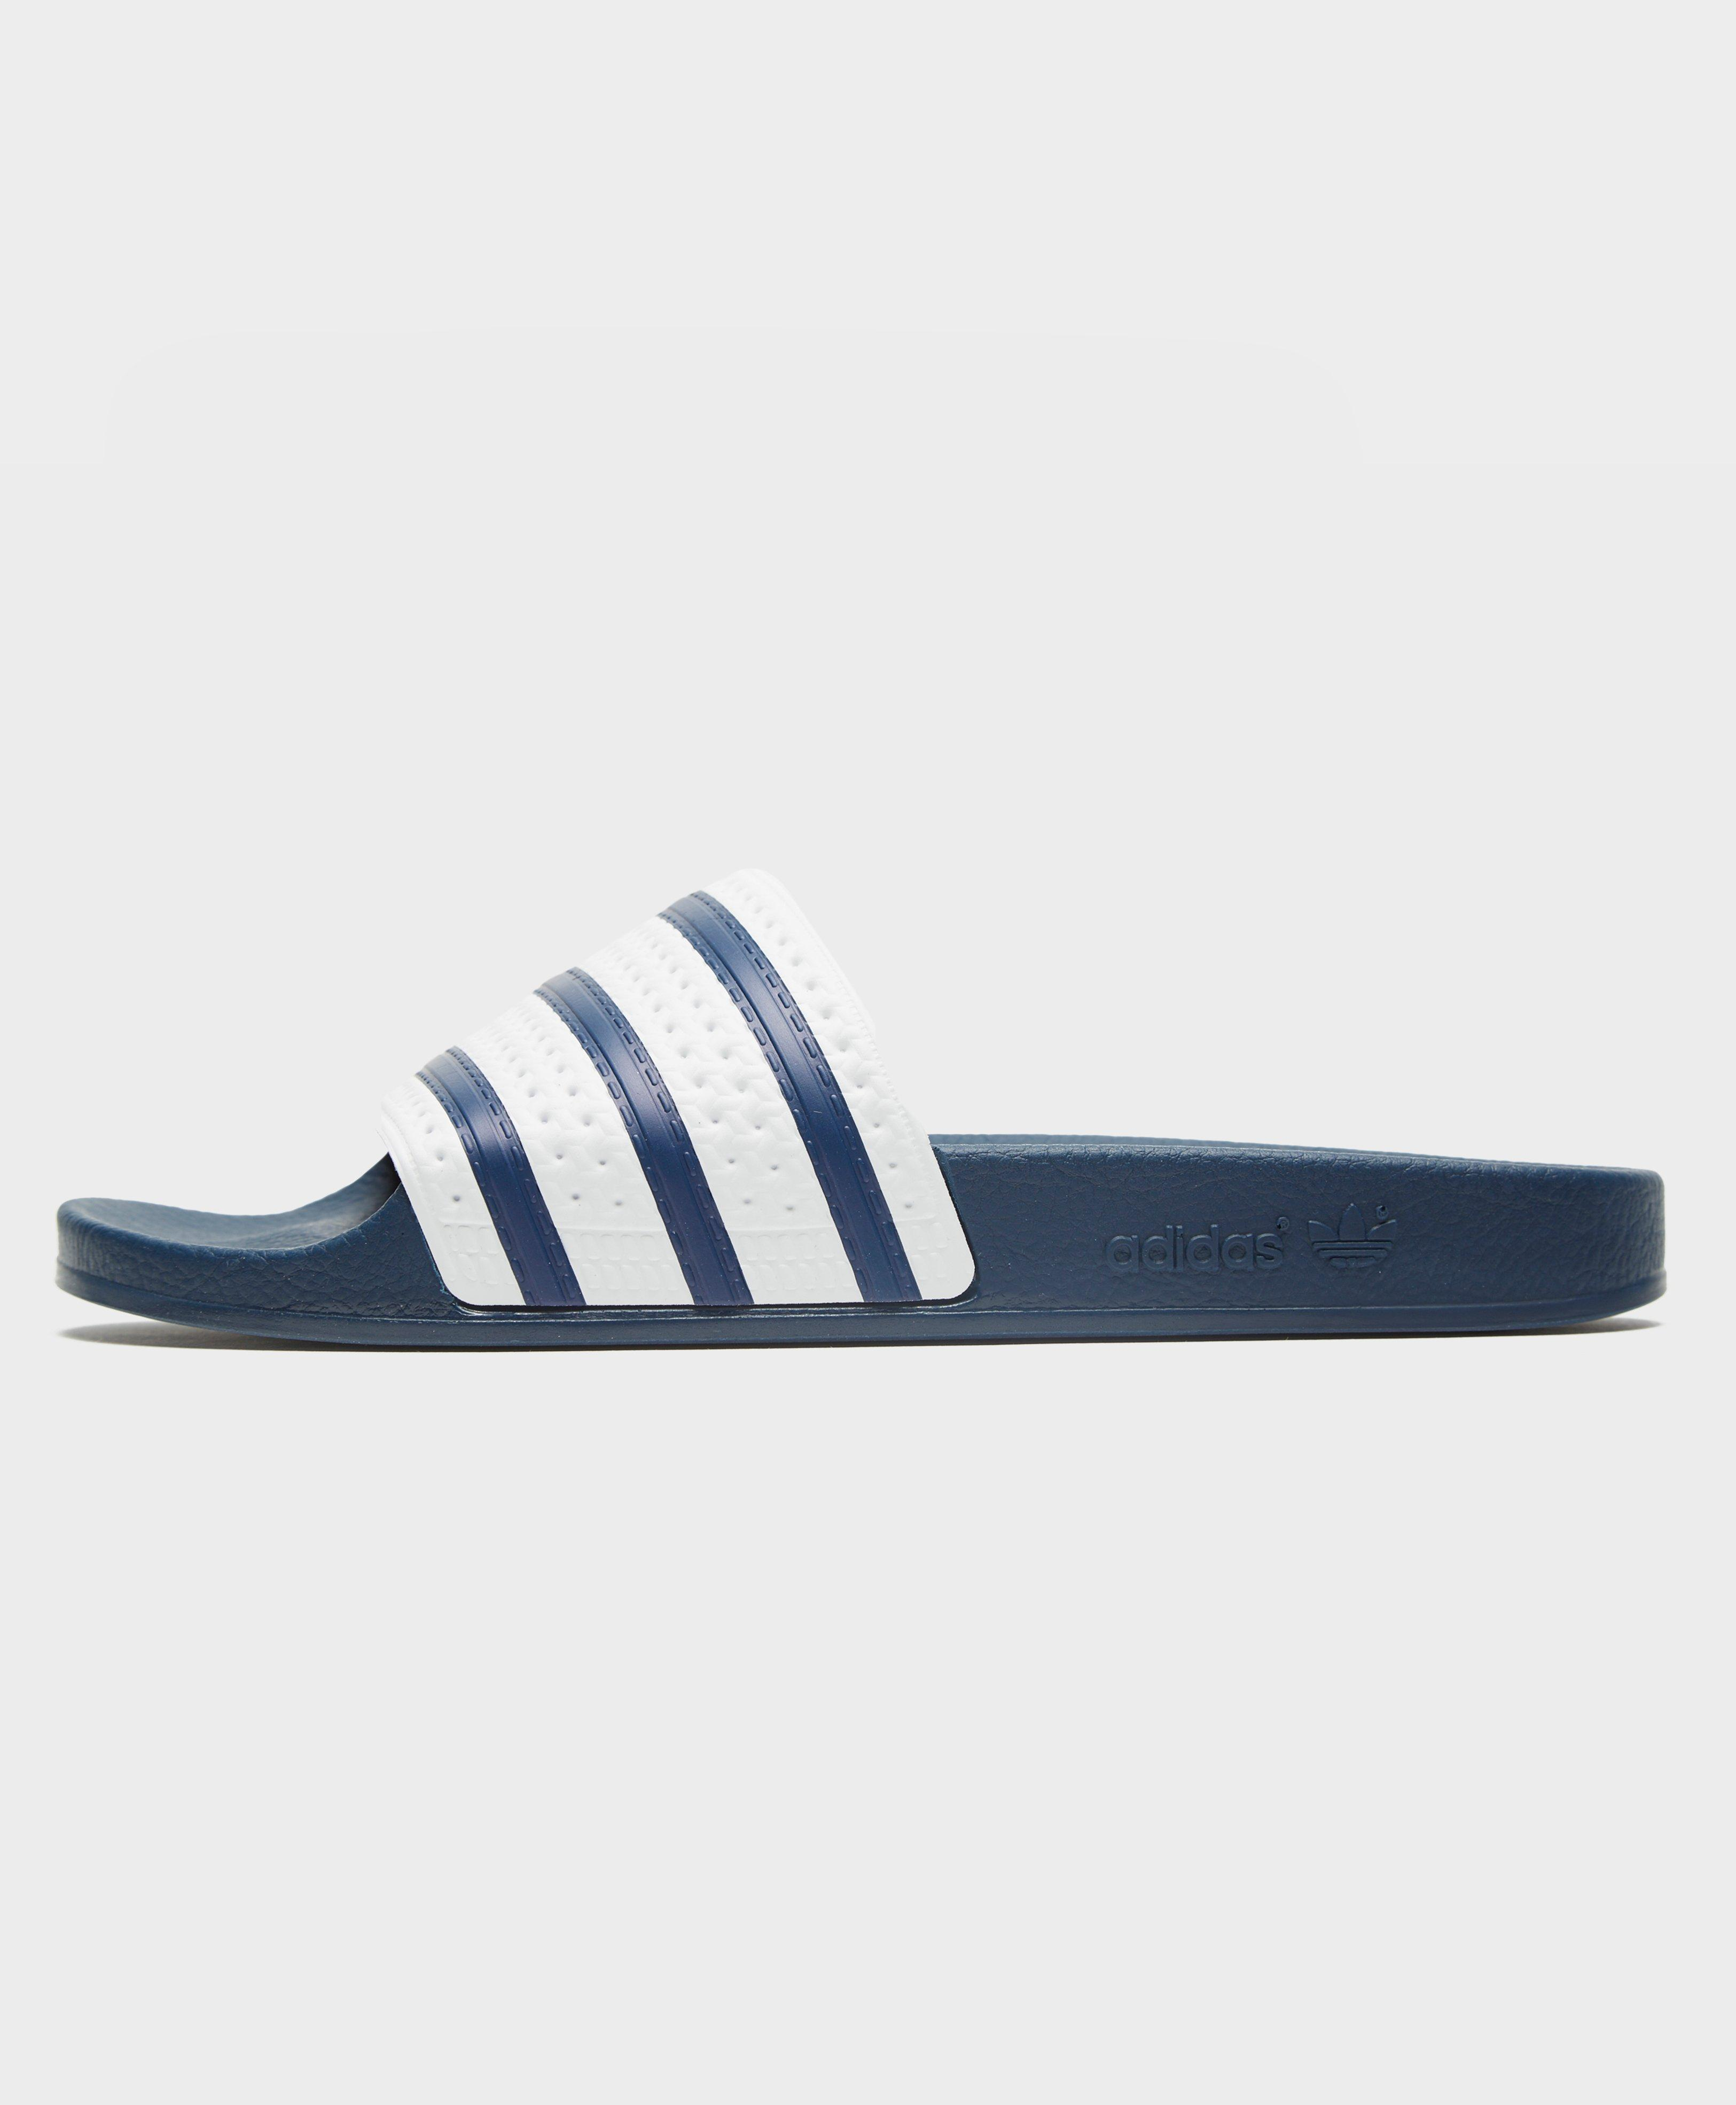 9b211ae2dbd54 Adidas Originals Adilette Slides in Blue for Men - Lyst